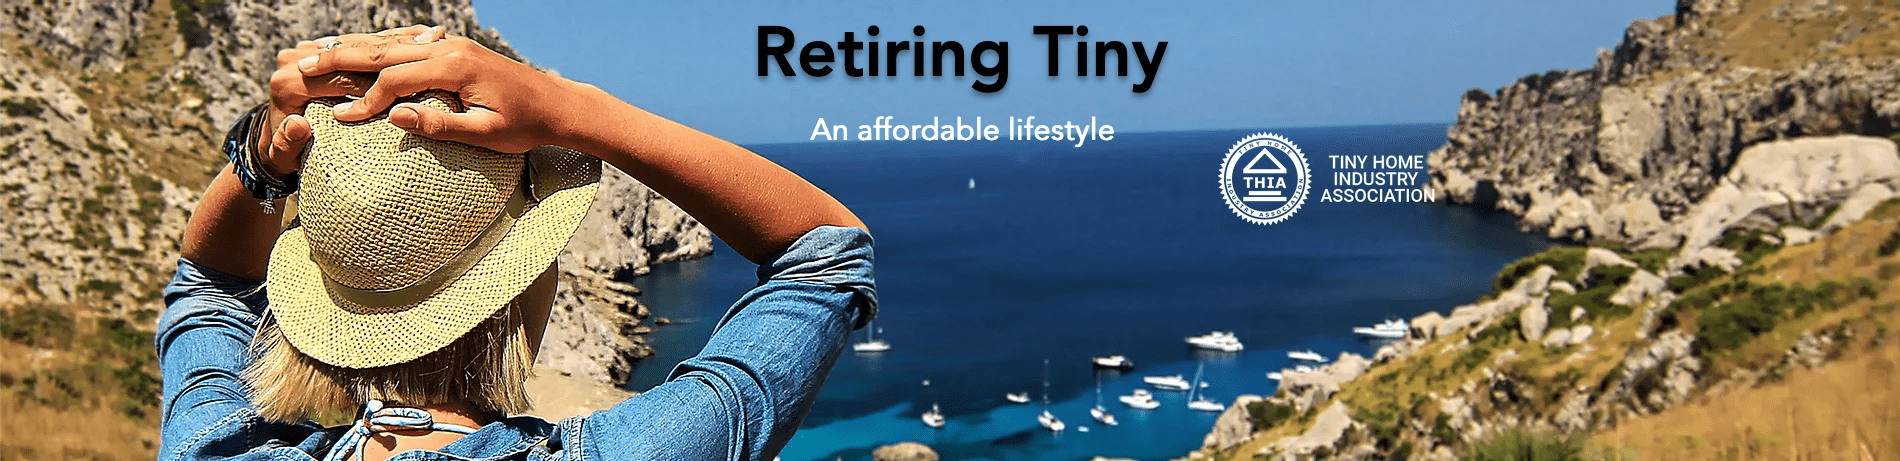 Retiring Tiny